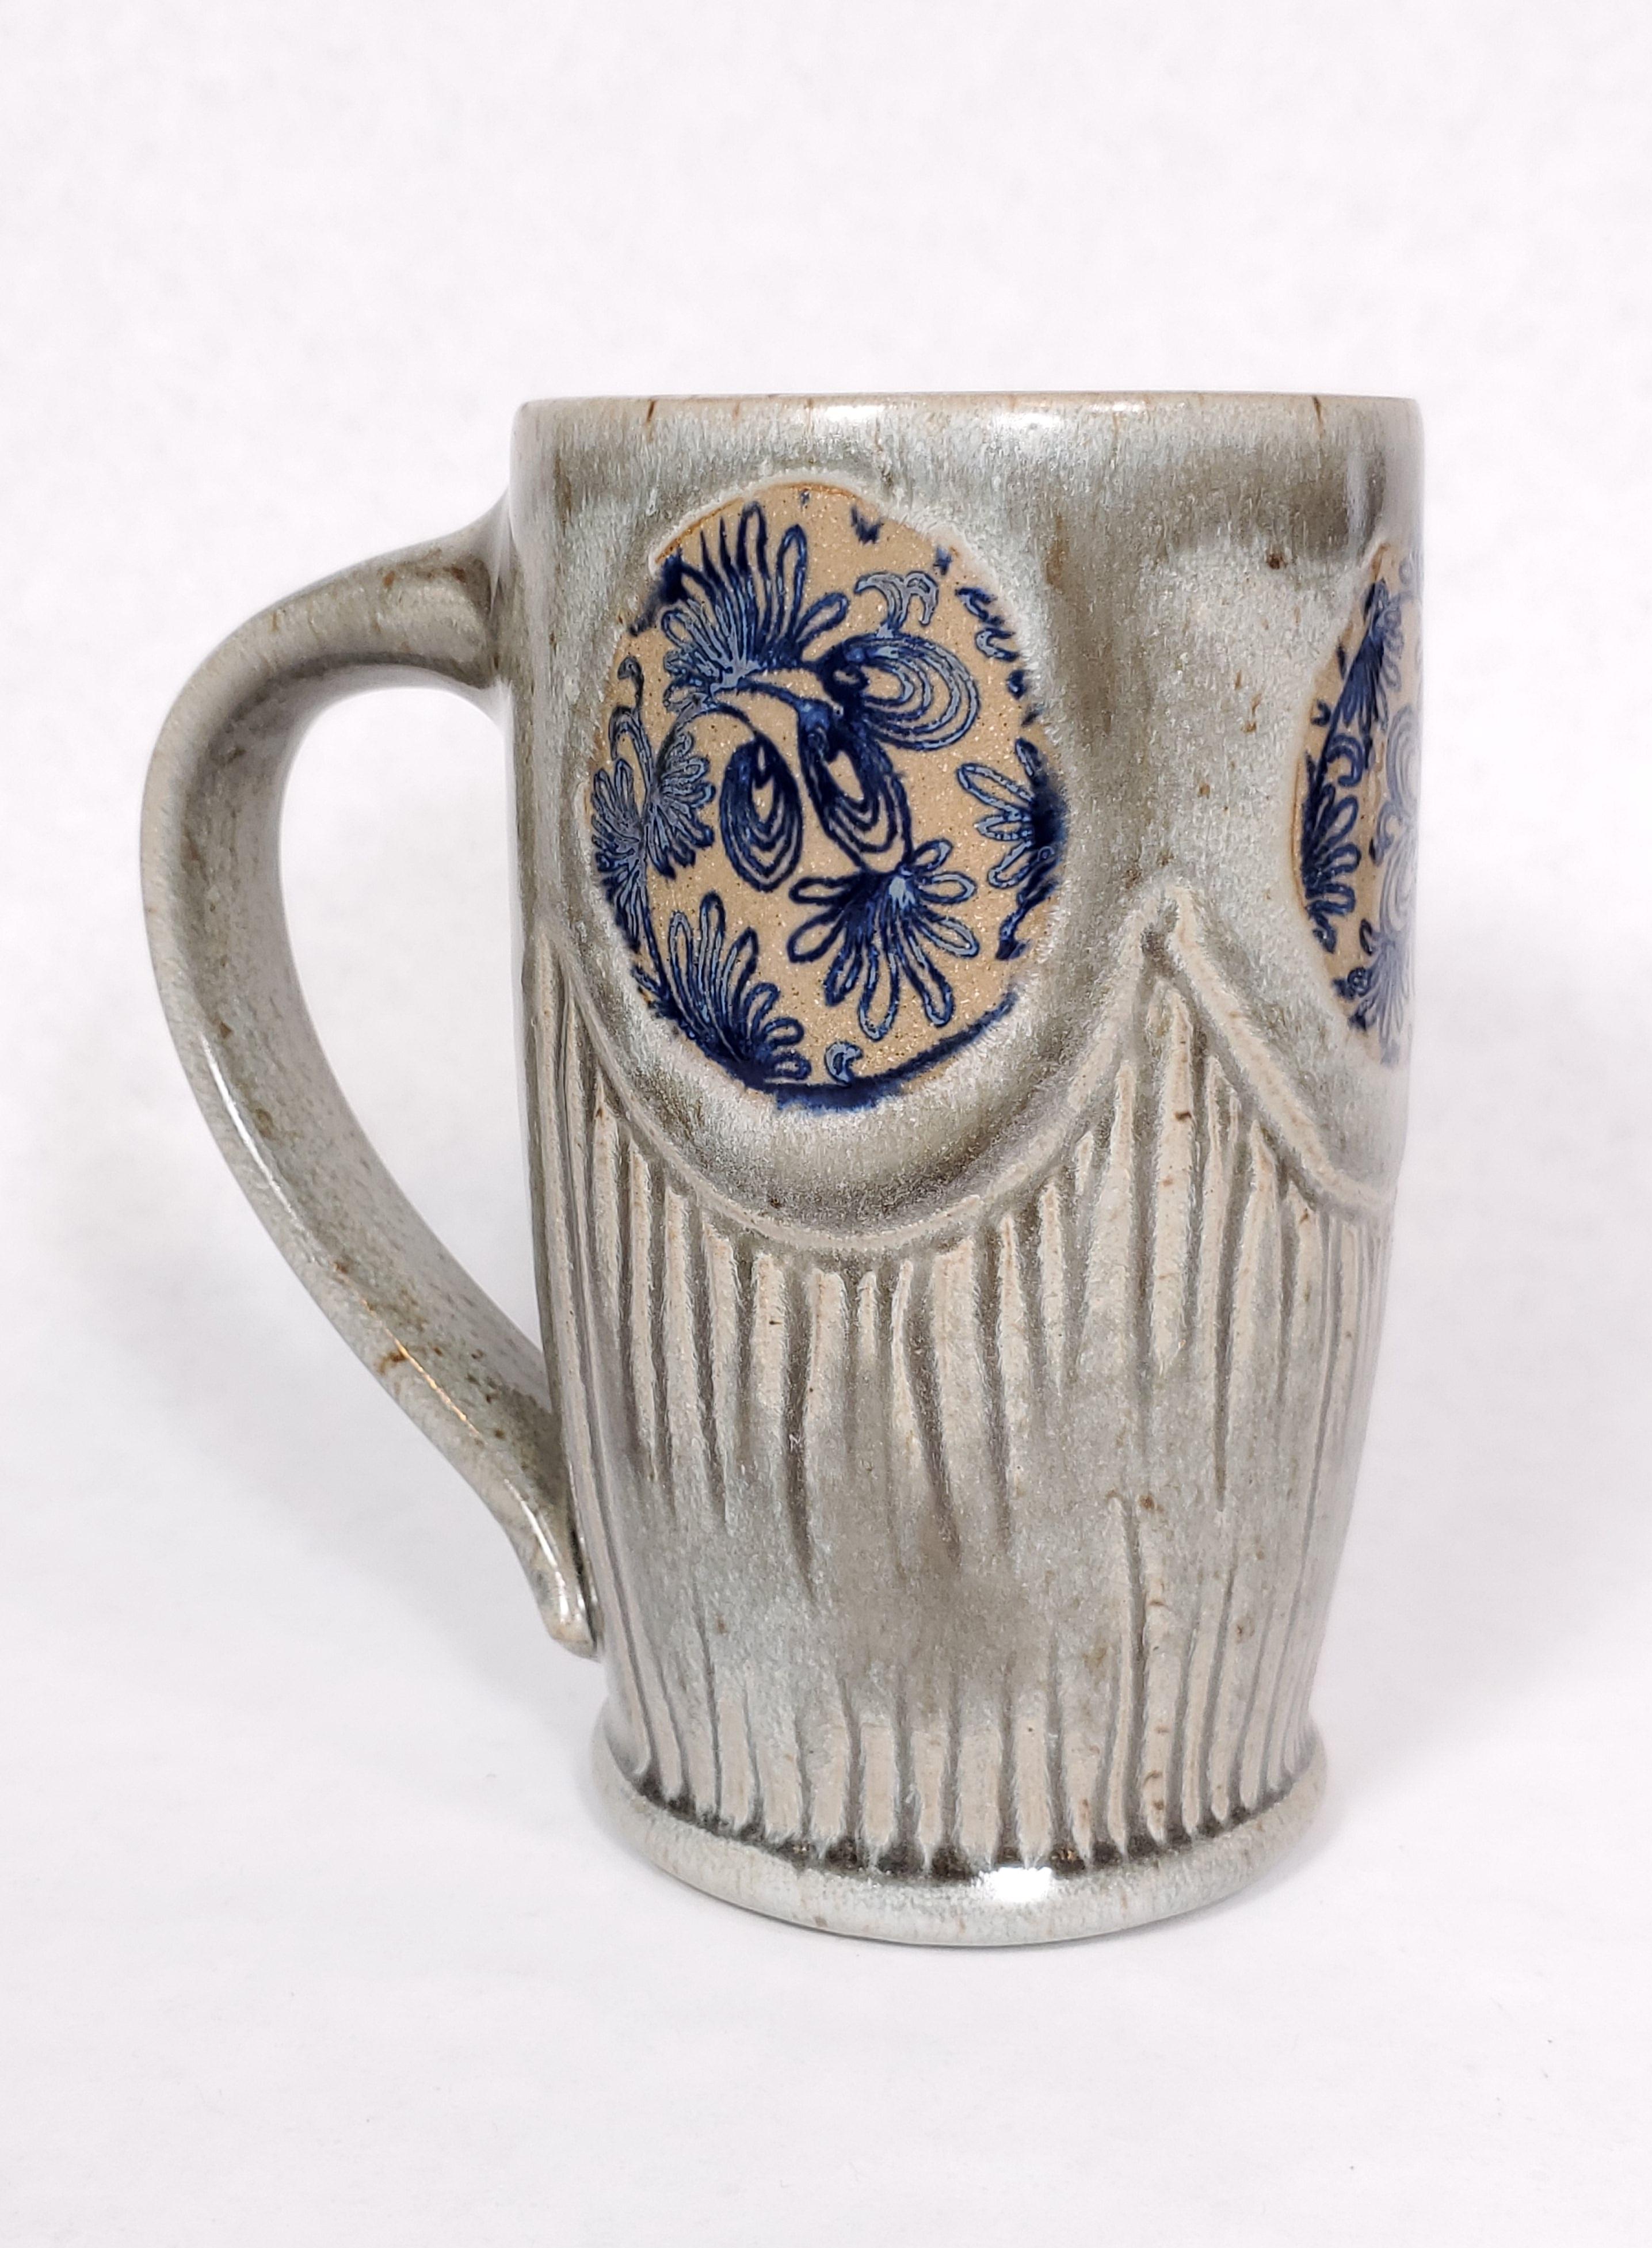 Tall Grey Mug, Blue floral